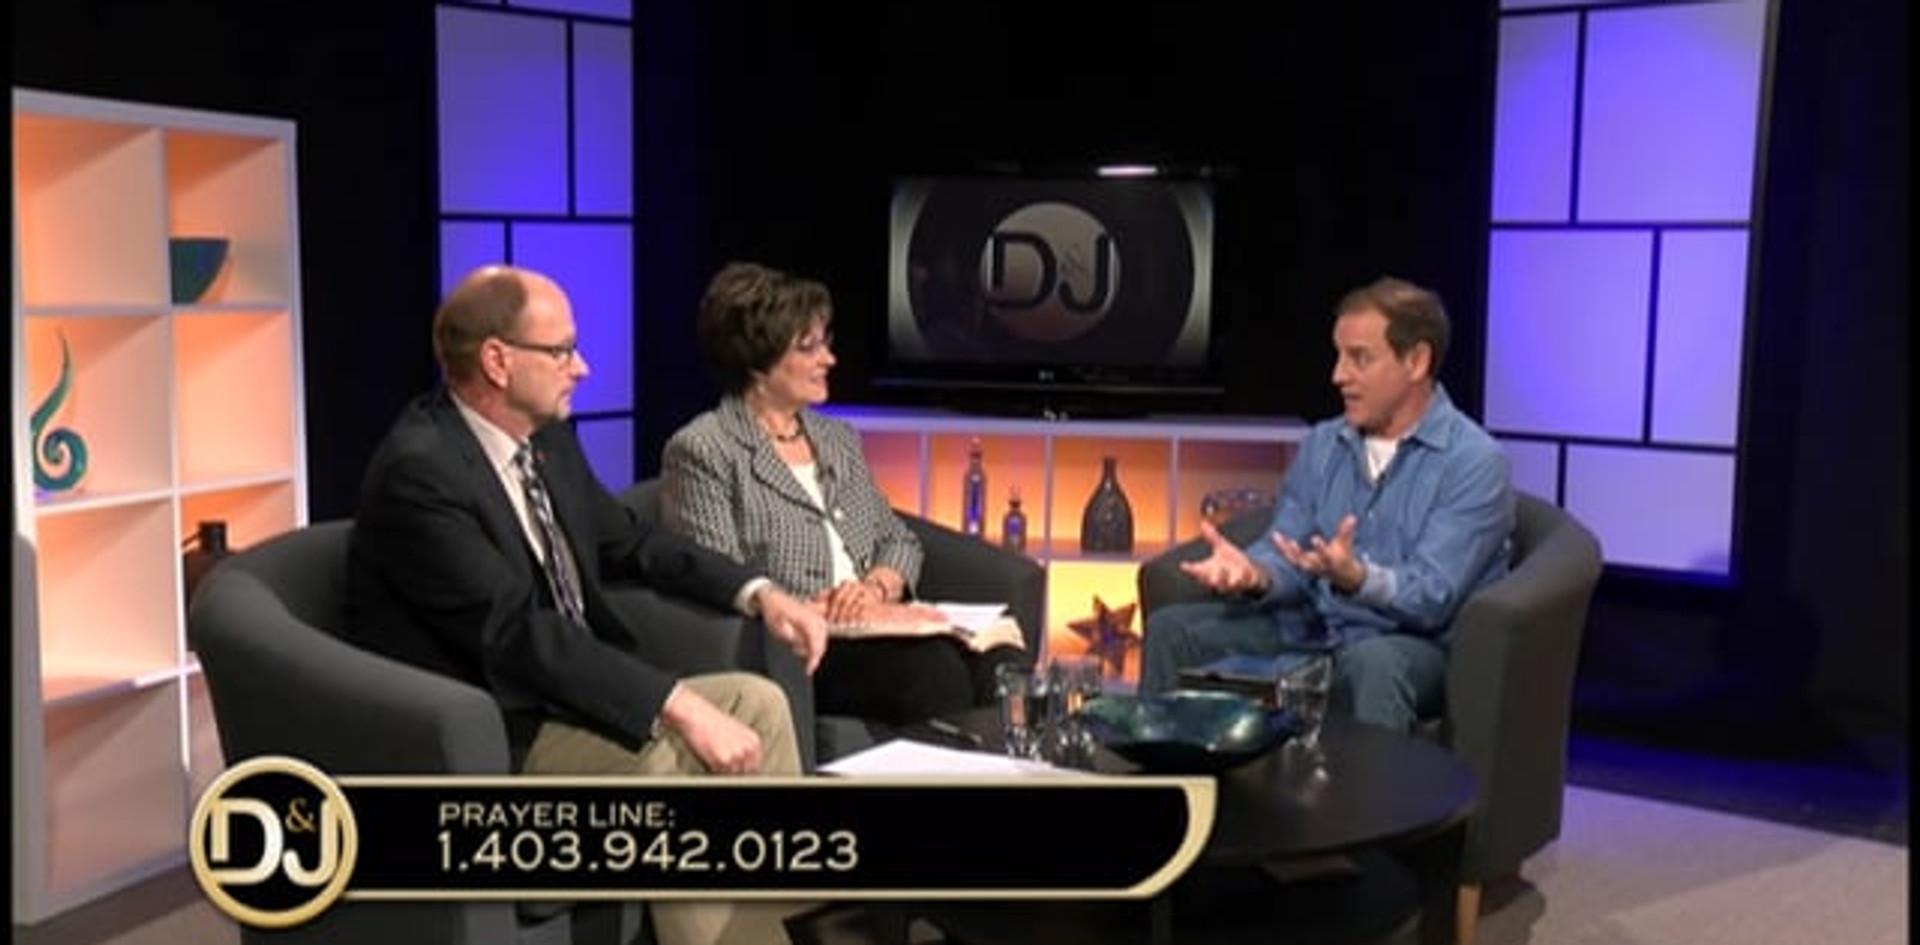 LIFELINE TODAY | Season 3, Episode 84 | Craig Buroker